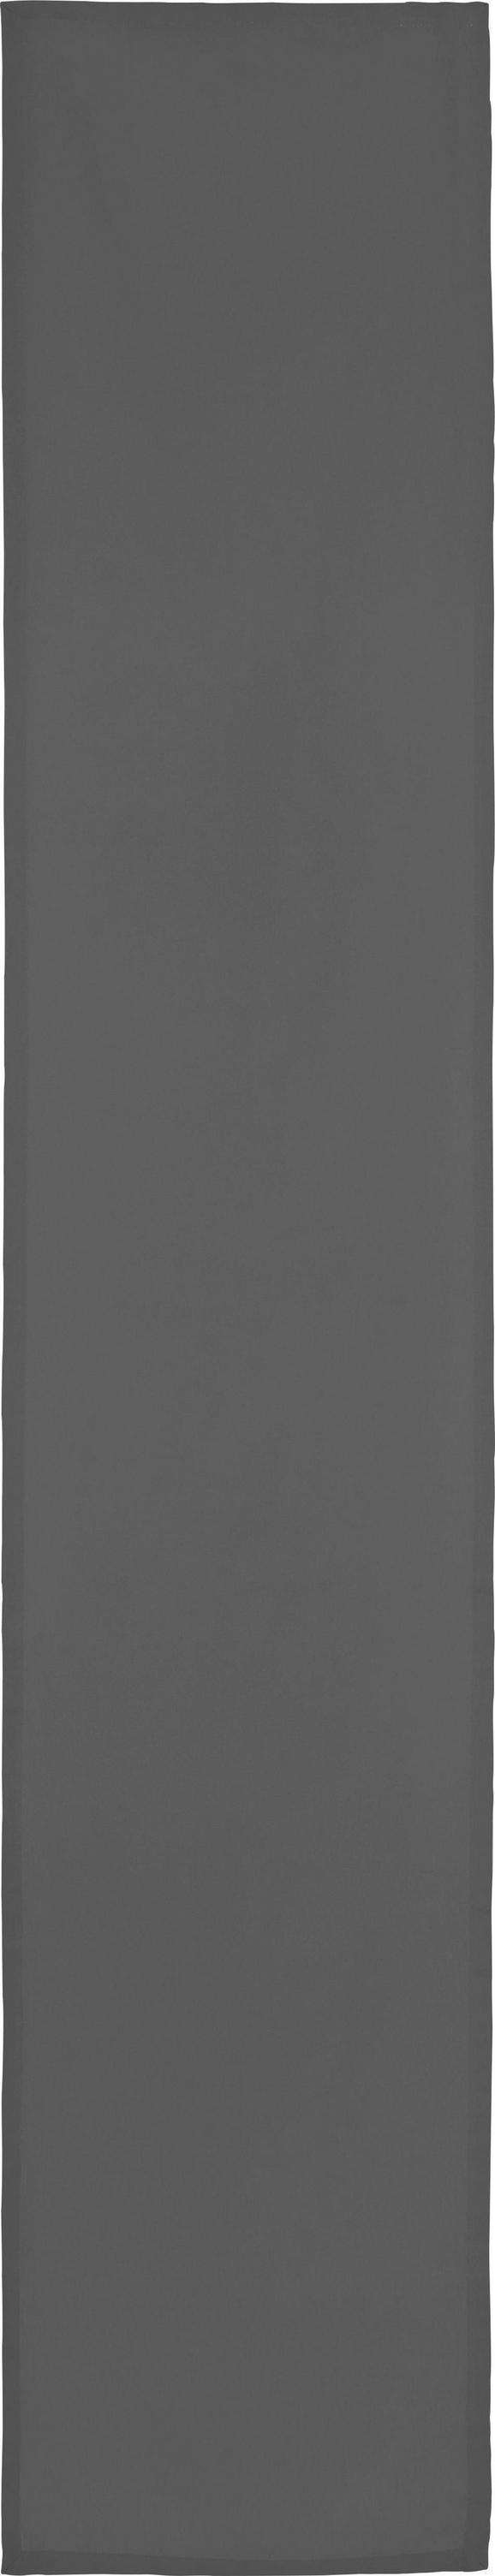 Nadprt Steffi Überlänge - antracit, tekstil (45/240cm) - MÖMAX modern living